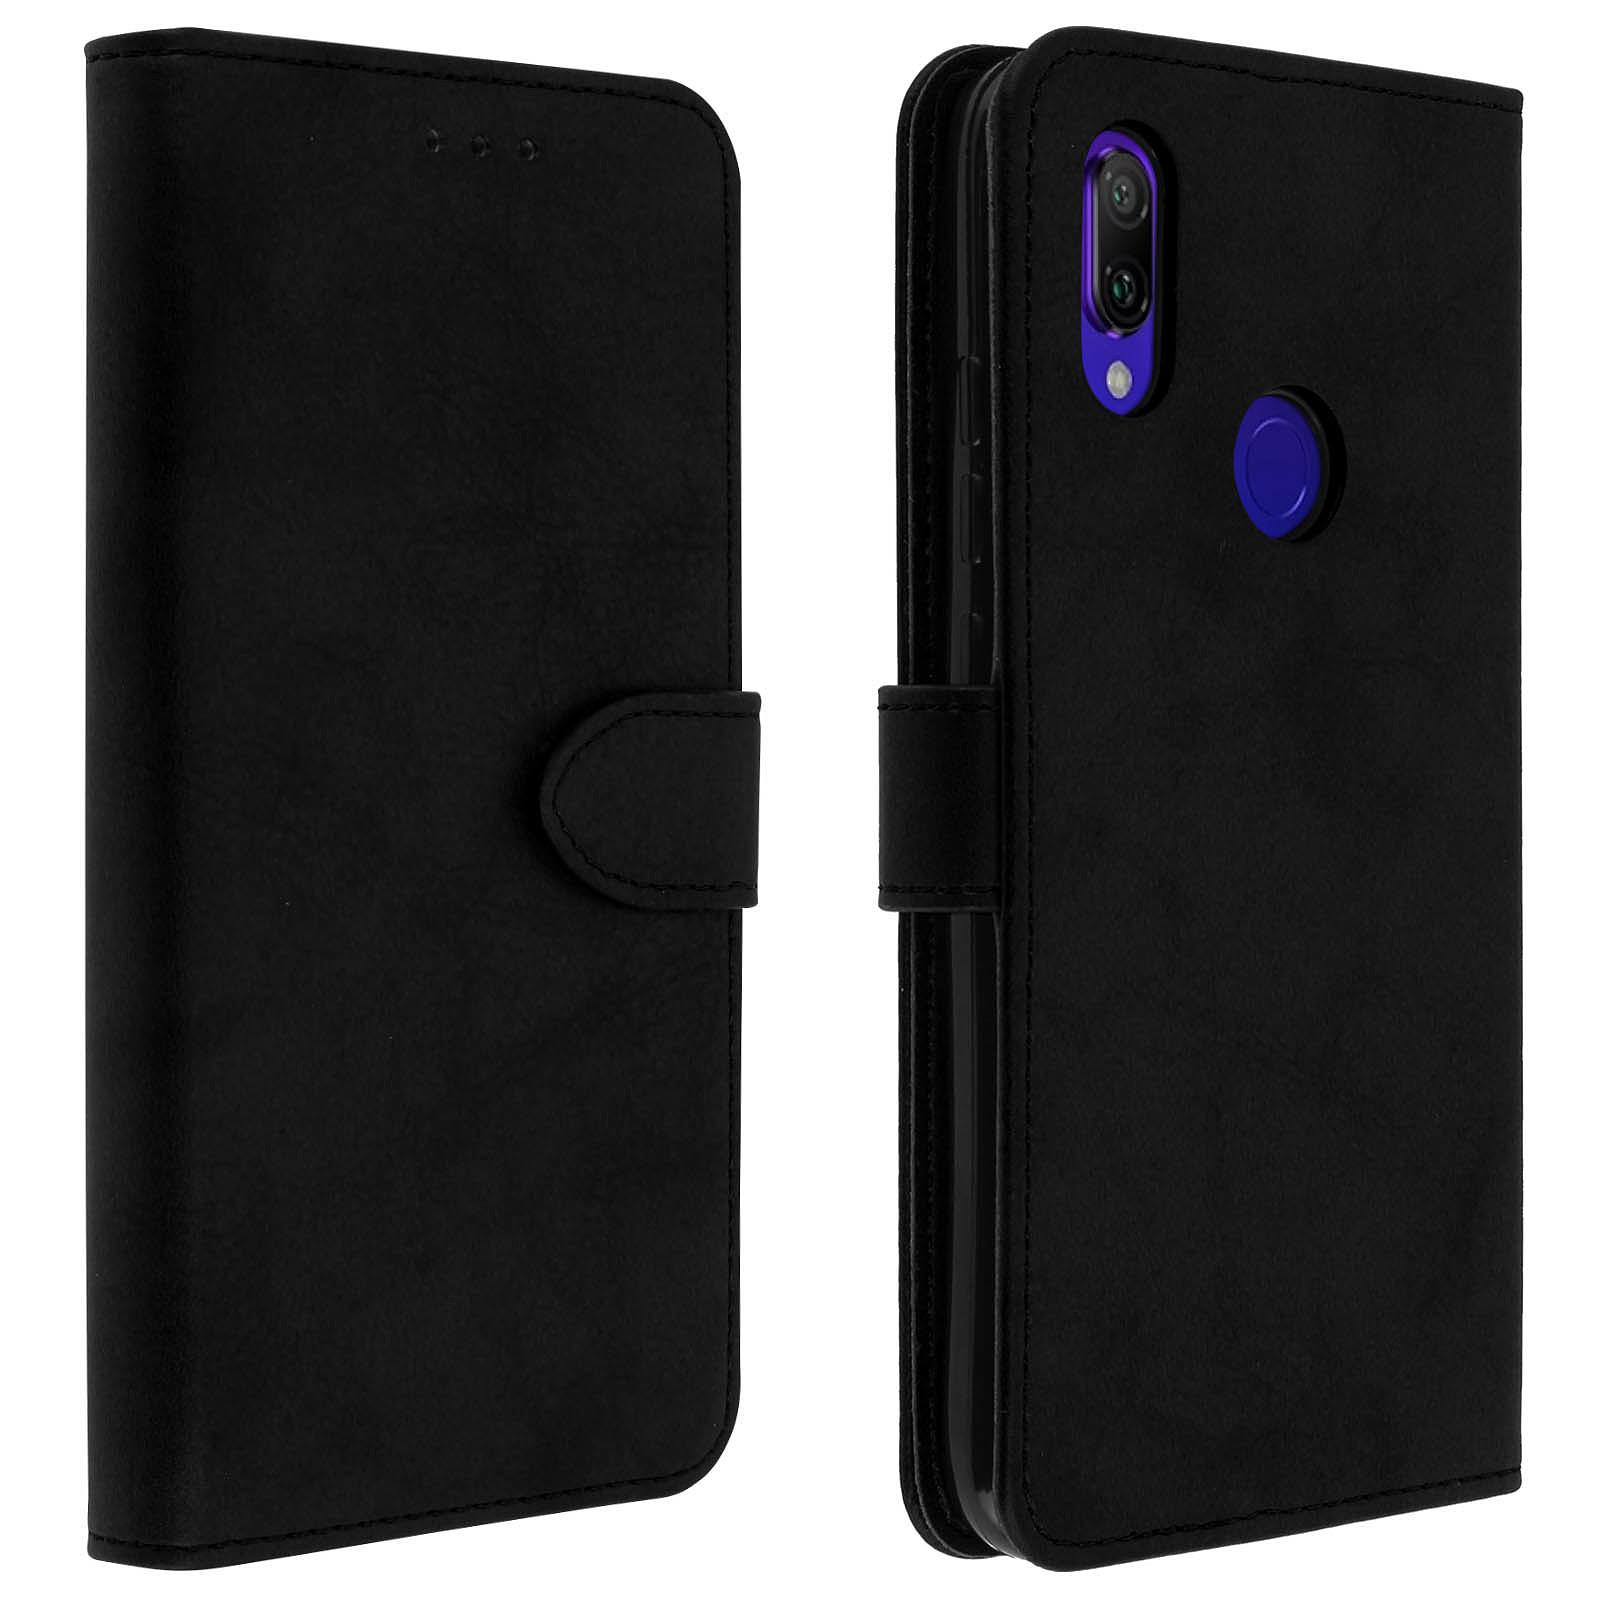 Avizar Etui folio Noir Portefeuille pour Xiaomi Redmi 7